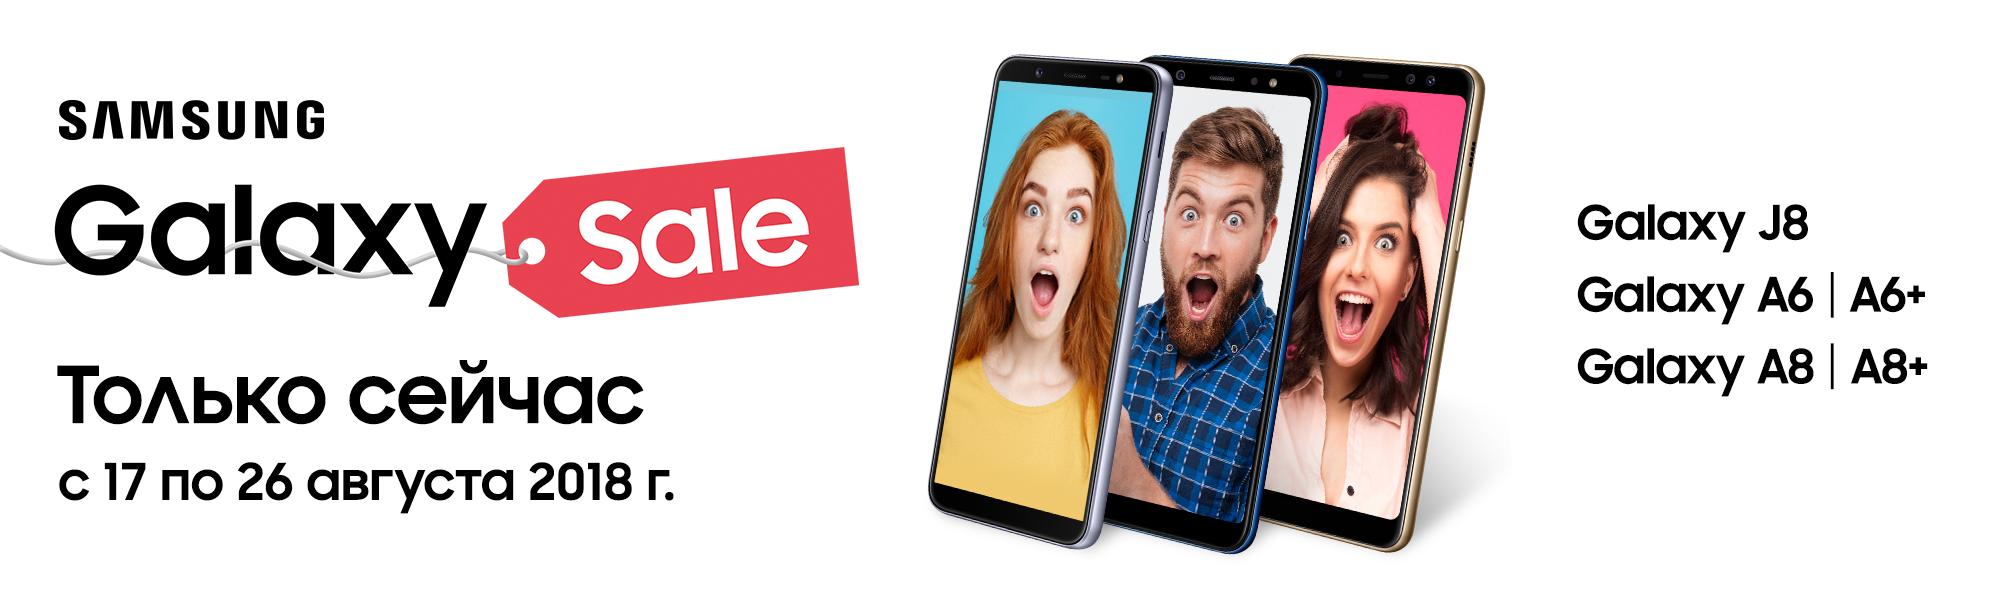 Samsung запускает акцию Galaxy Sale